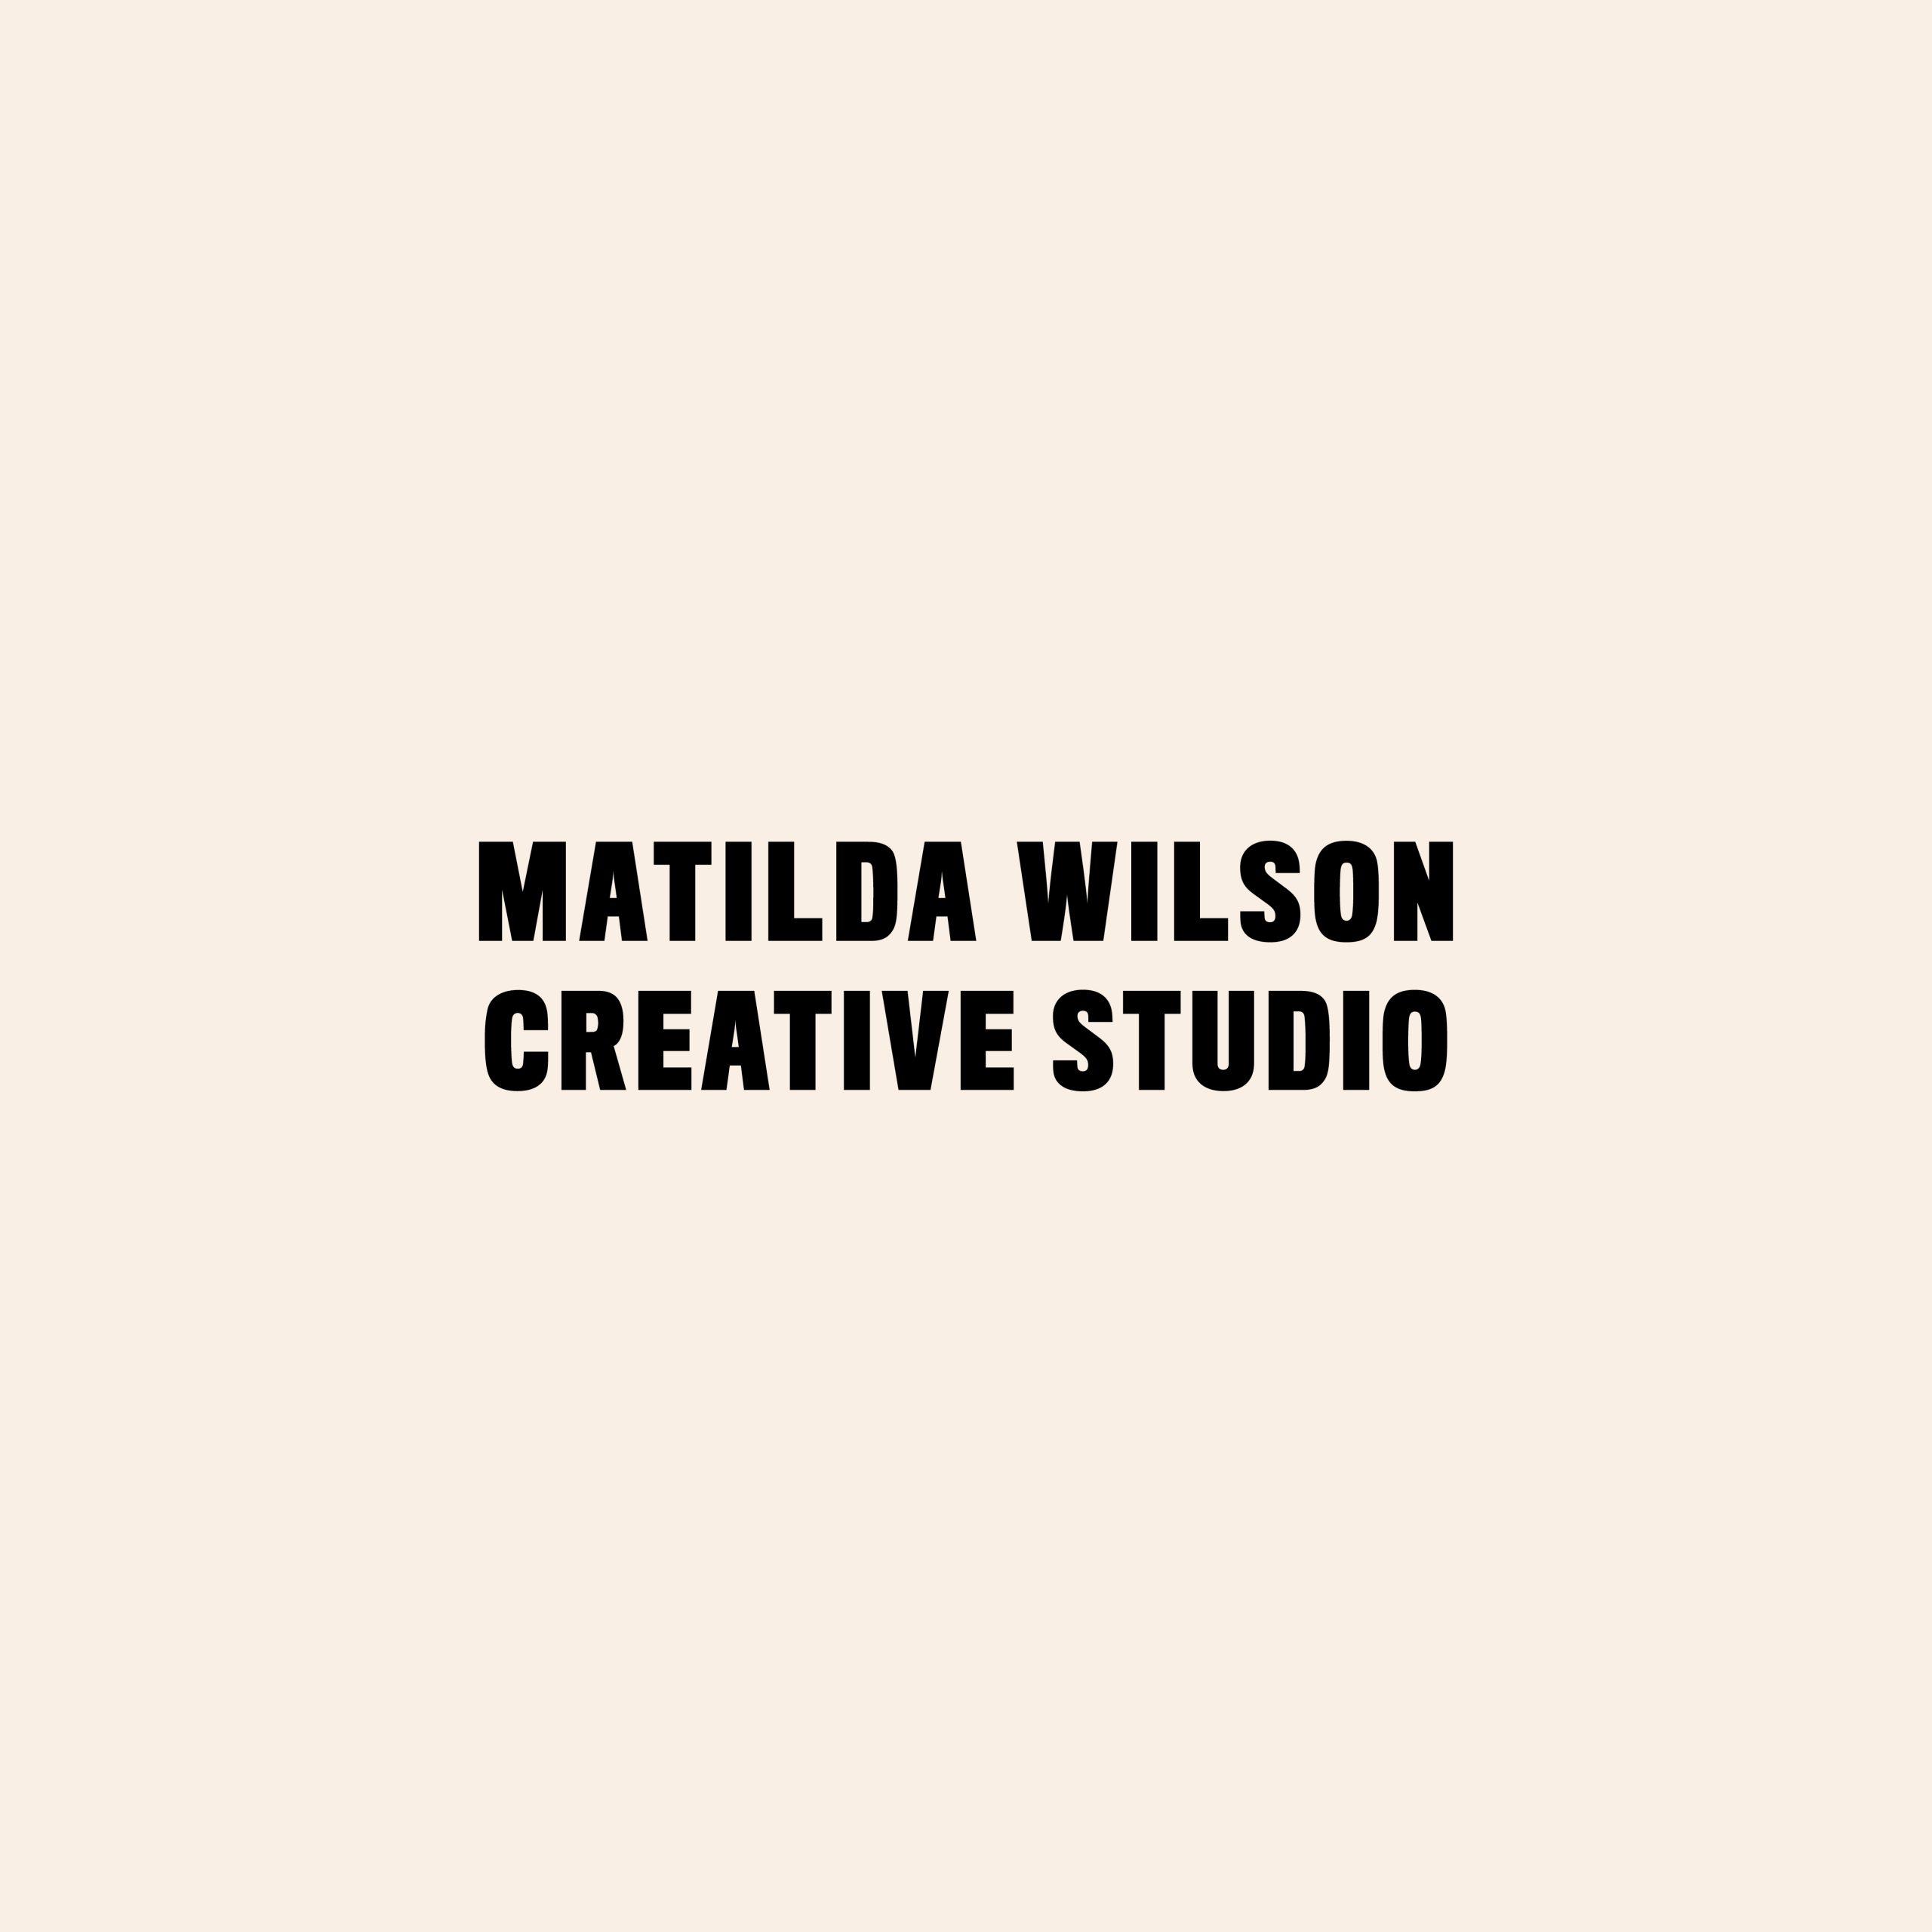 Matilda Wilson Creative